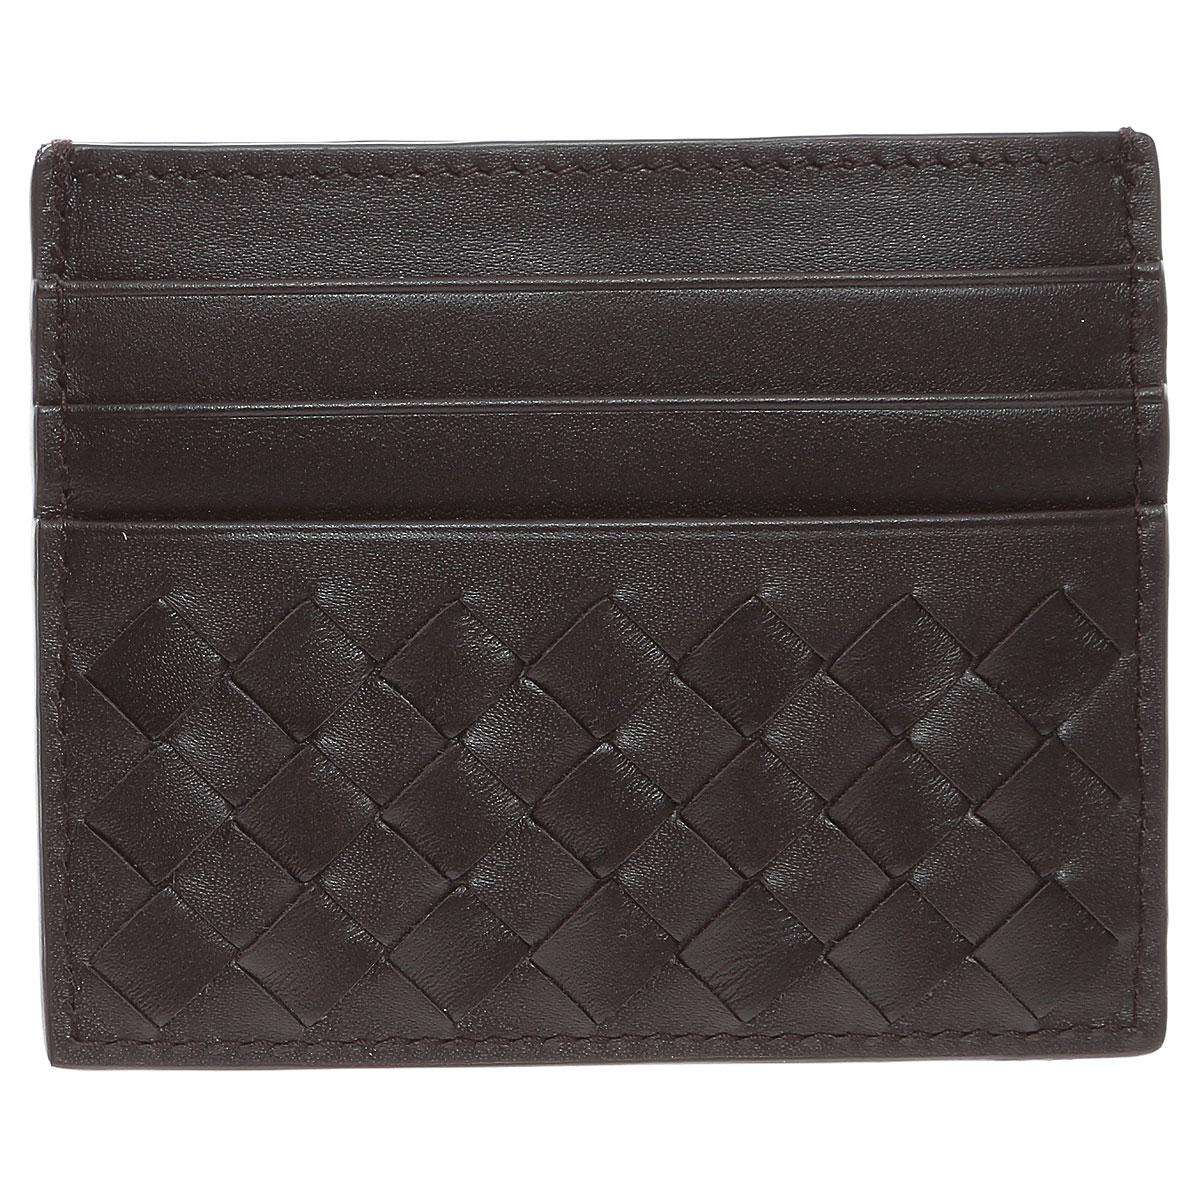 Image of Bottega Veneta Card Holder for Women, Espresso, Leather, 2017